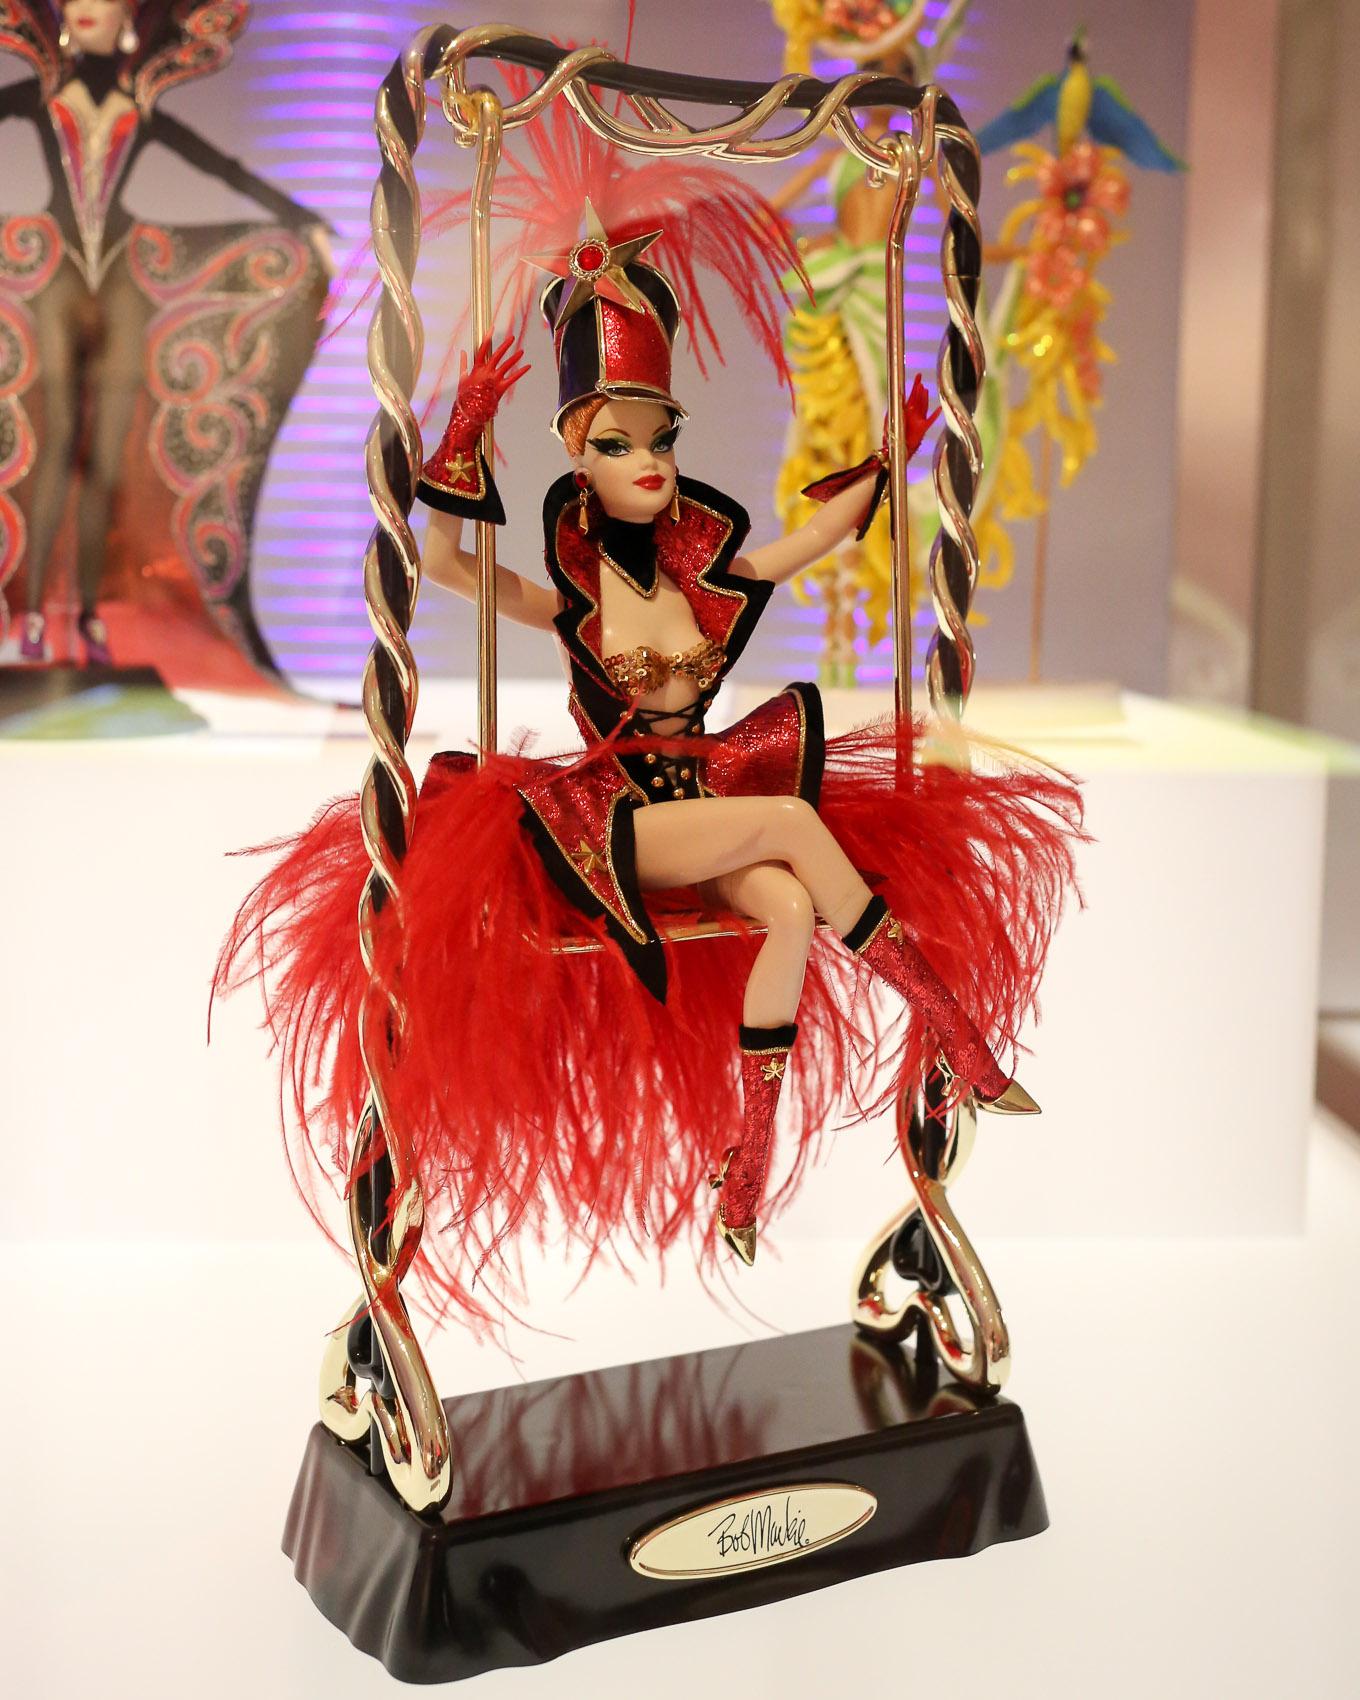 Kansallismuseo - Barbie-näyttely-7.jpg